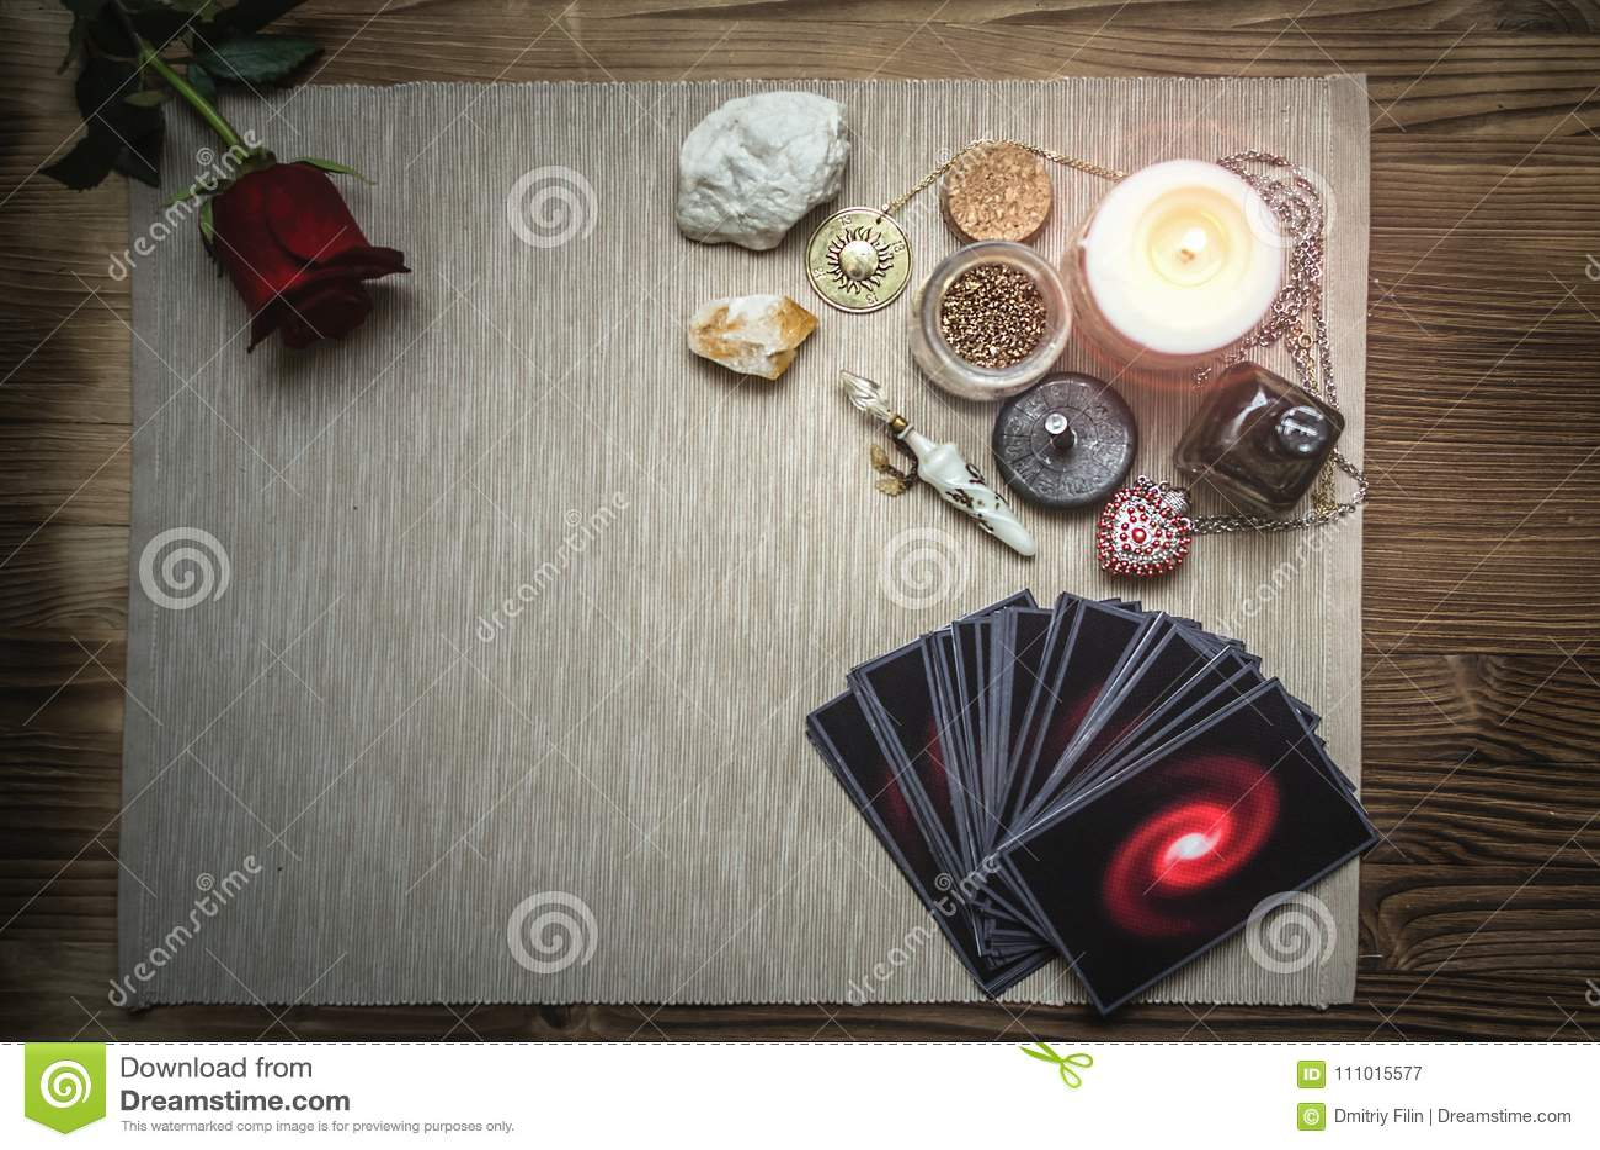 Tarot Cards  Fortune Teller  Divination  Stock Image - Image